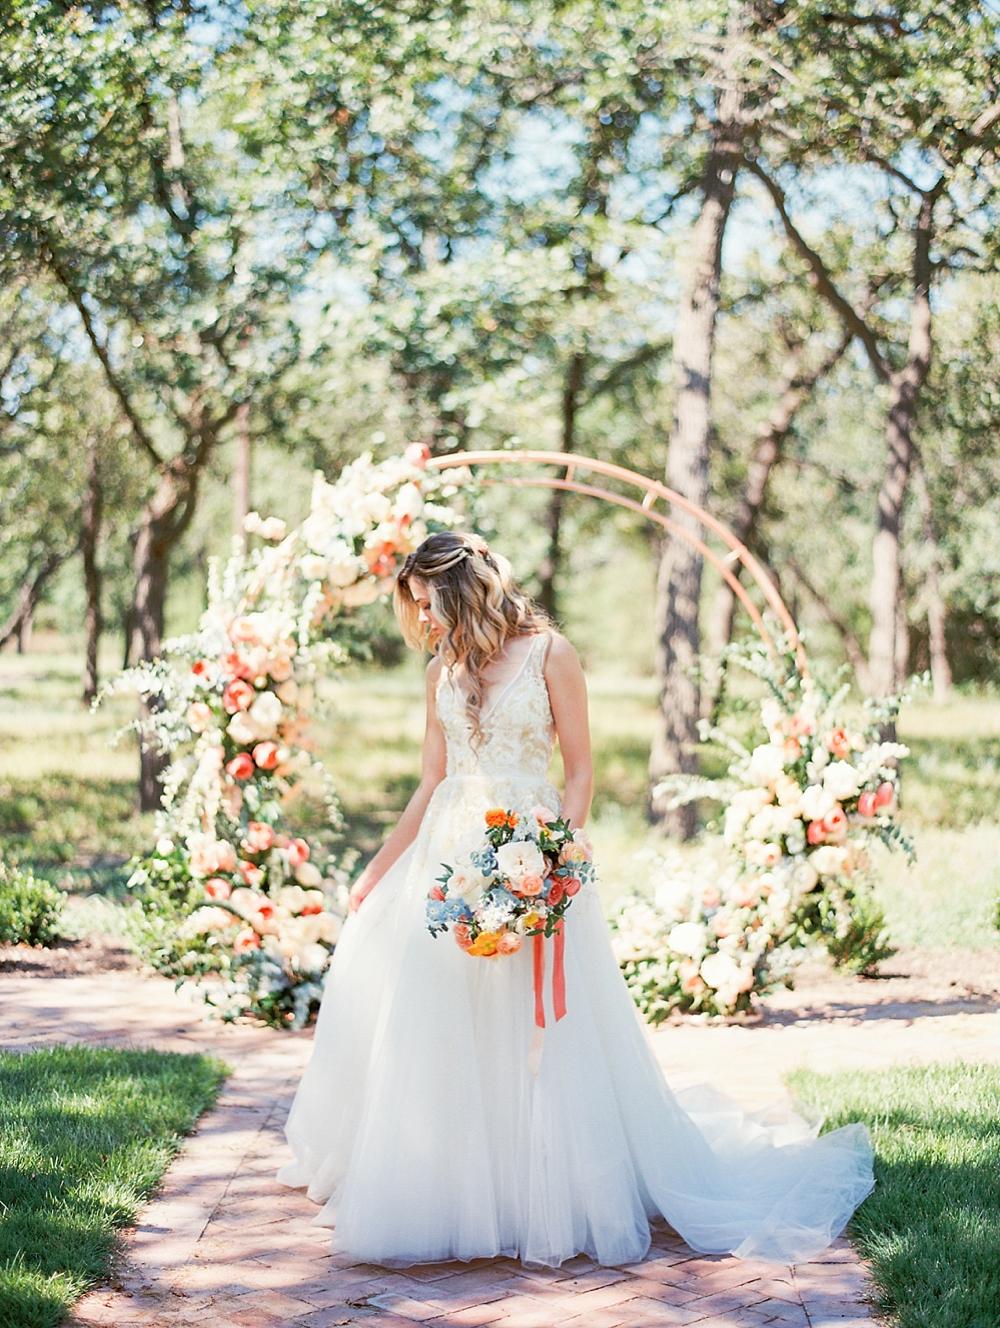 Kristin-La-Voie-Photography-Austin-Wedding-Photographer-the-grand-lady-45